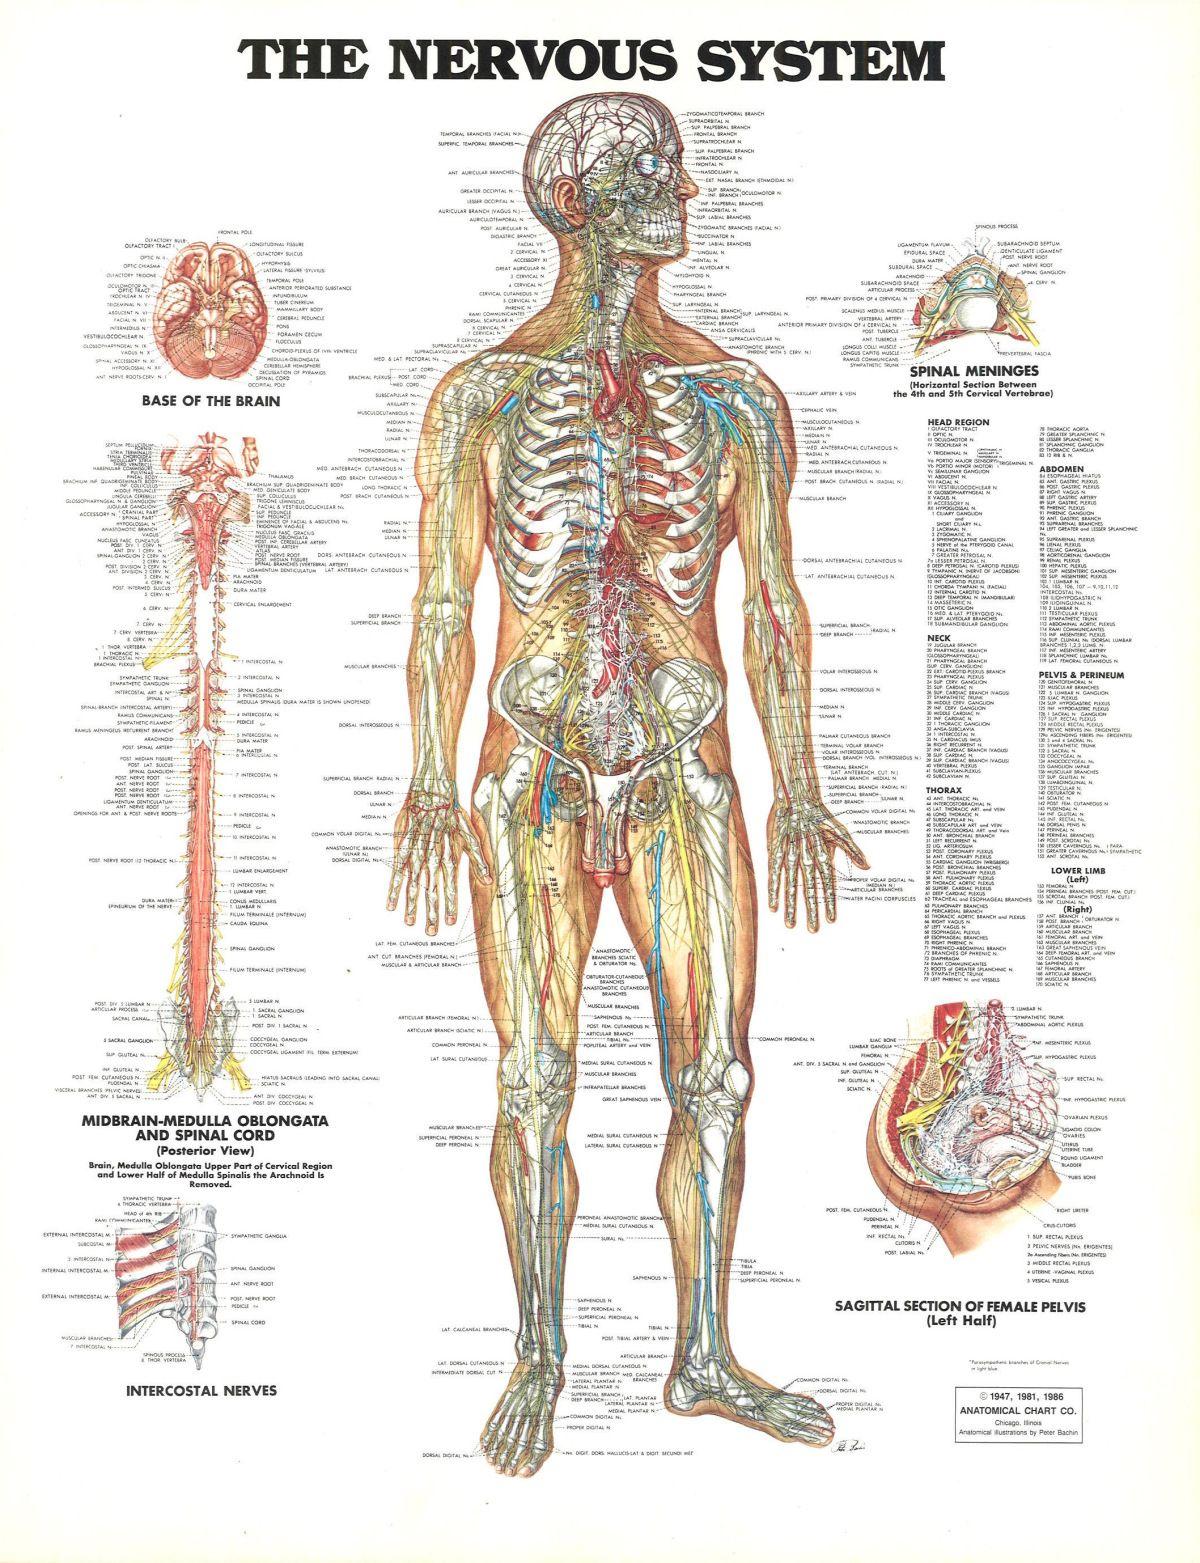 1947 1981 1986 Anatomical Chart Company Chicago Illinois Ilration By Peter Bachin